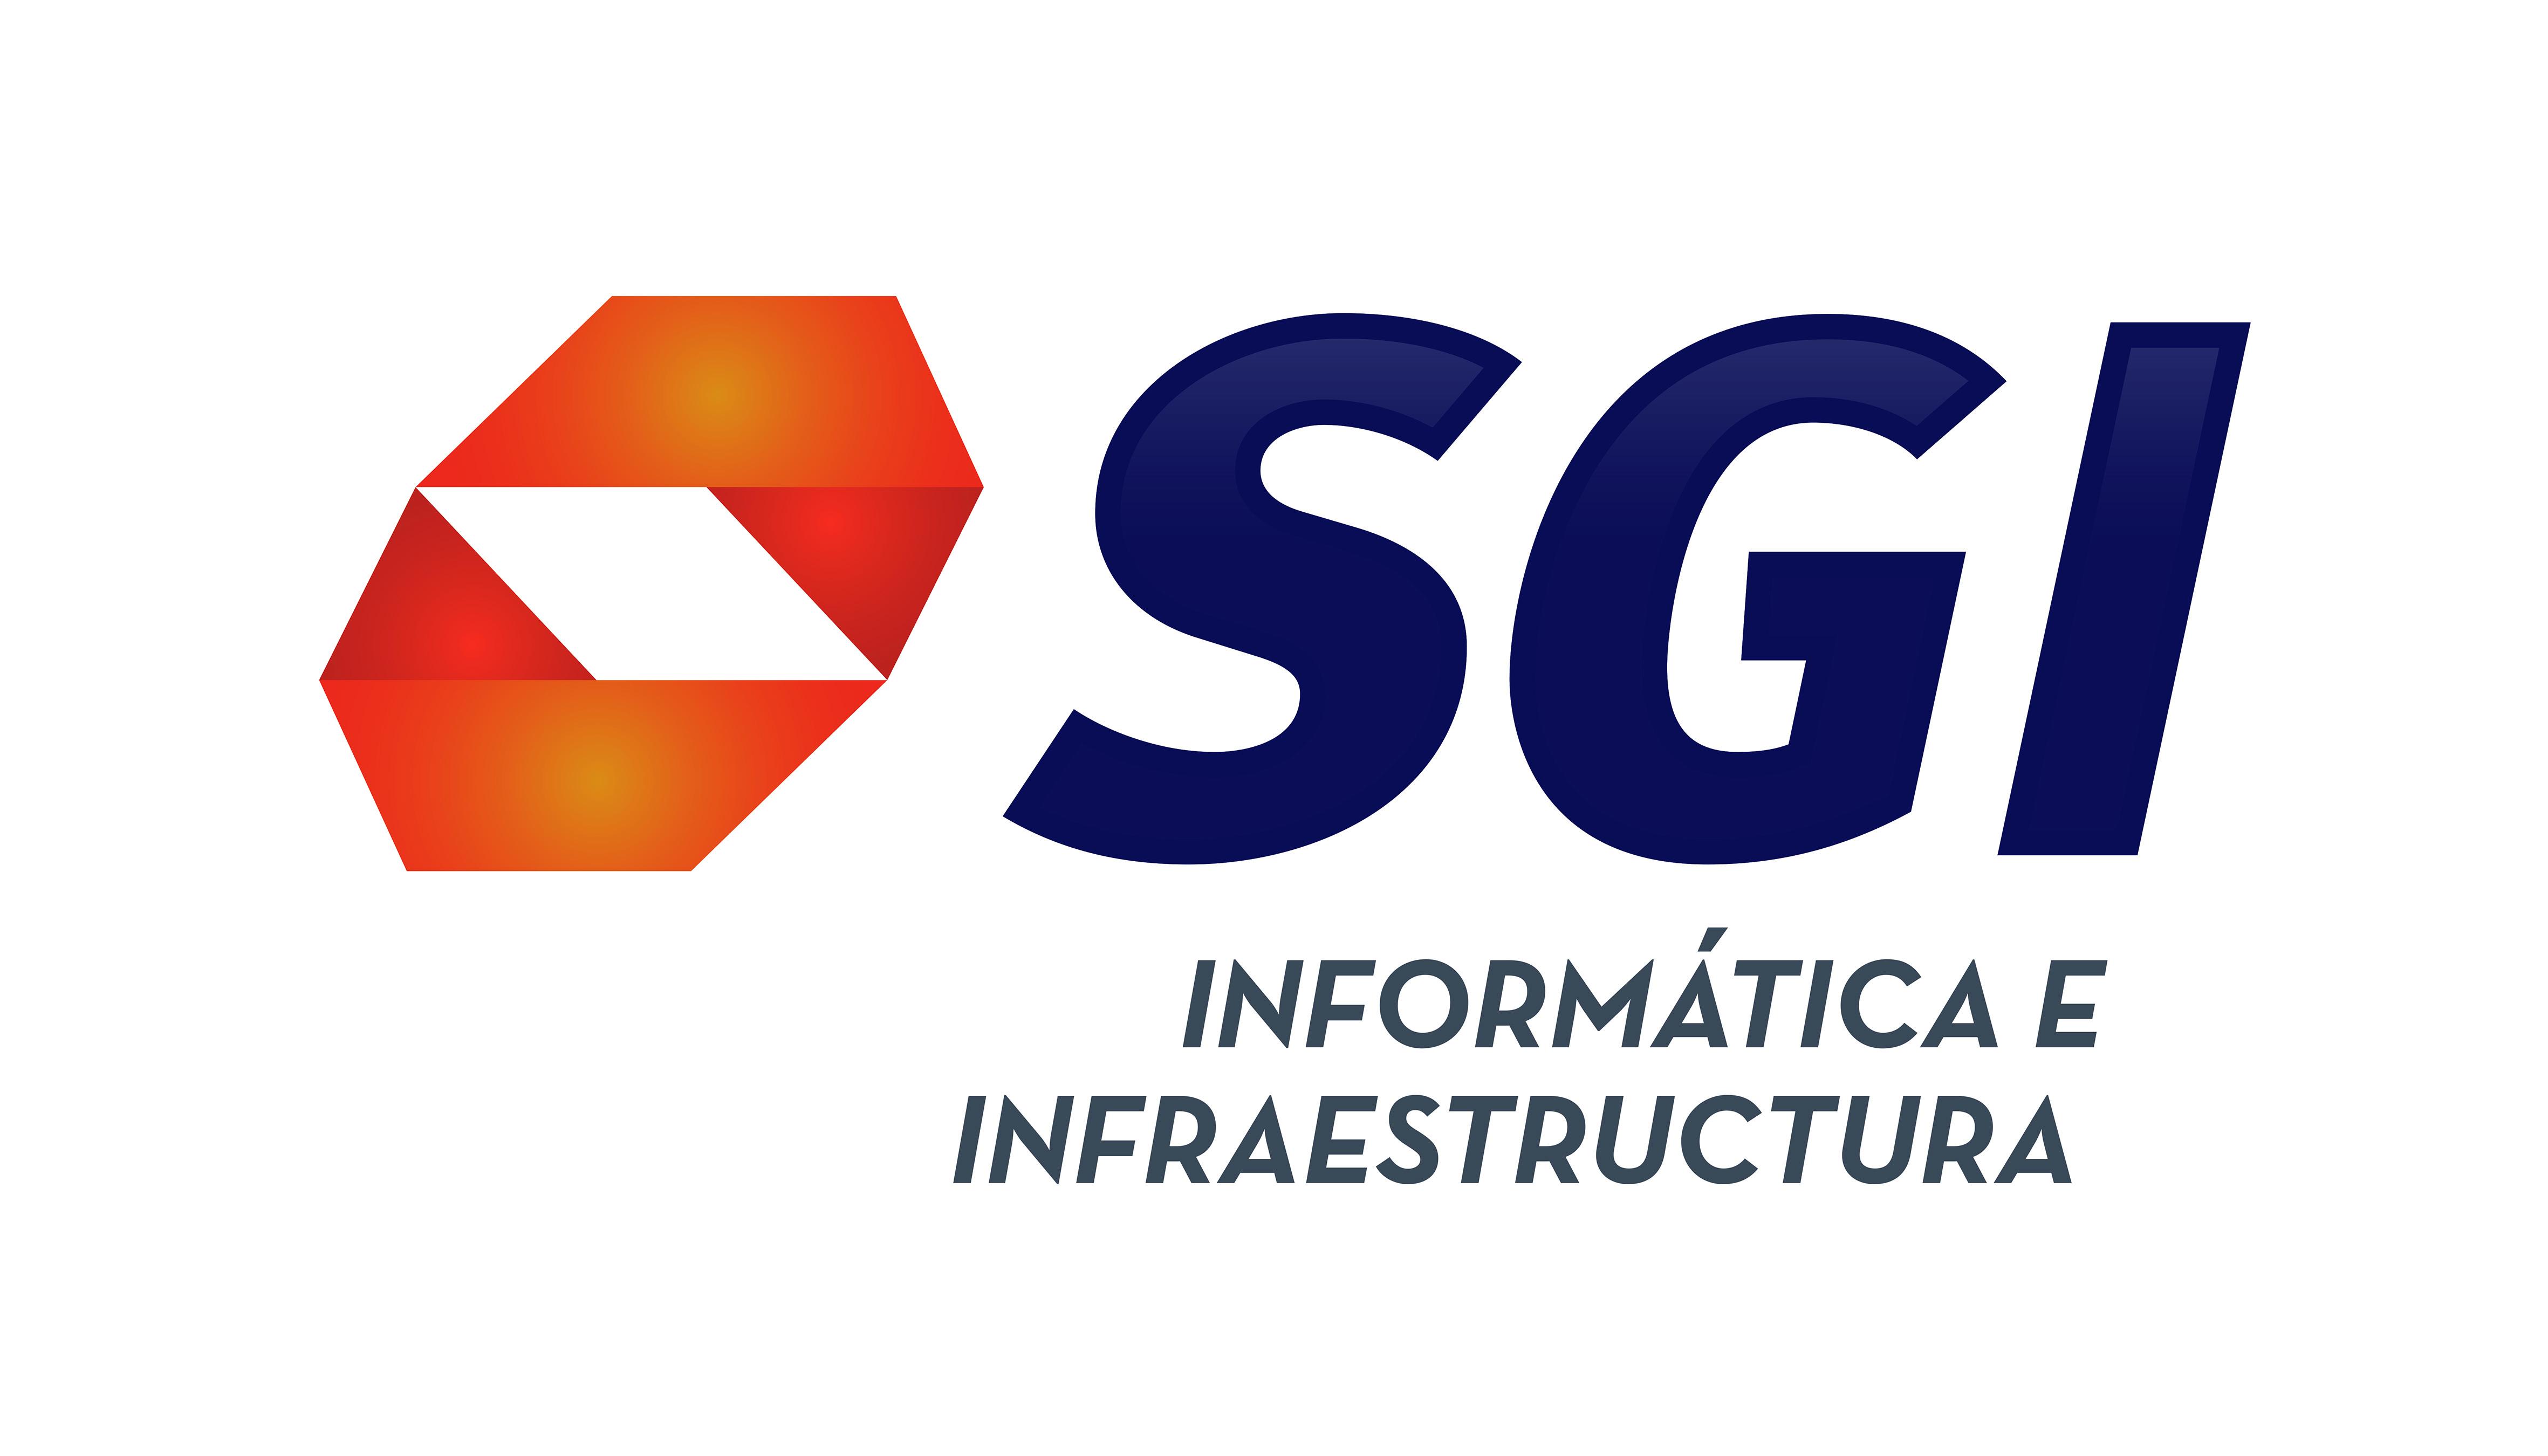 SGI Informatica & Infraestructura logo